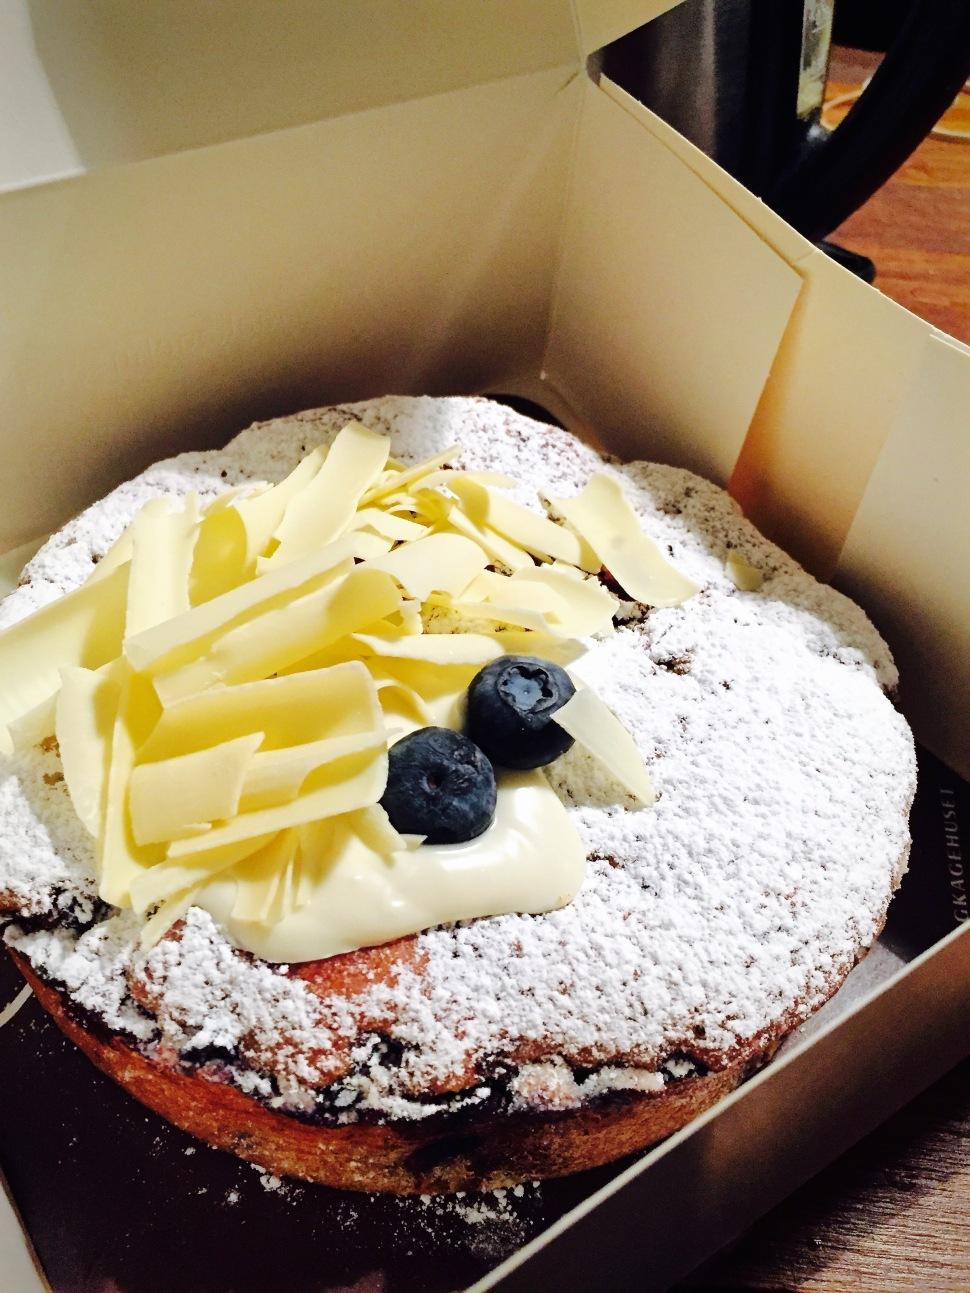 Food_Dinner_Cake